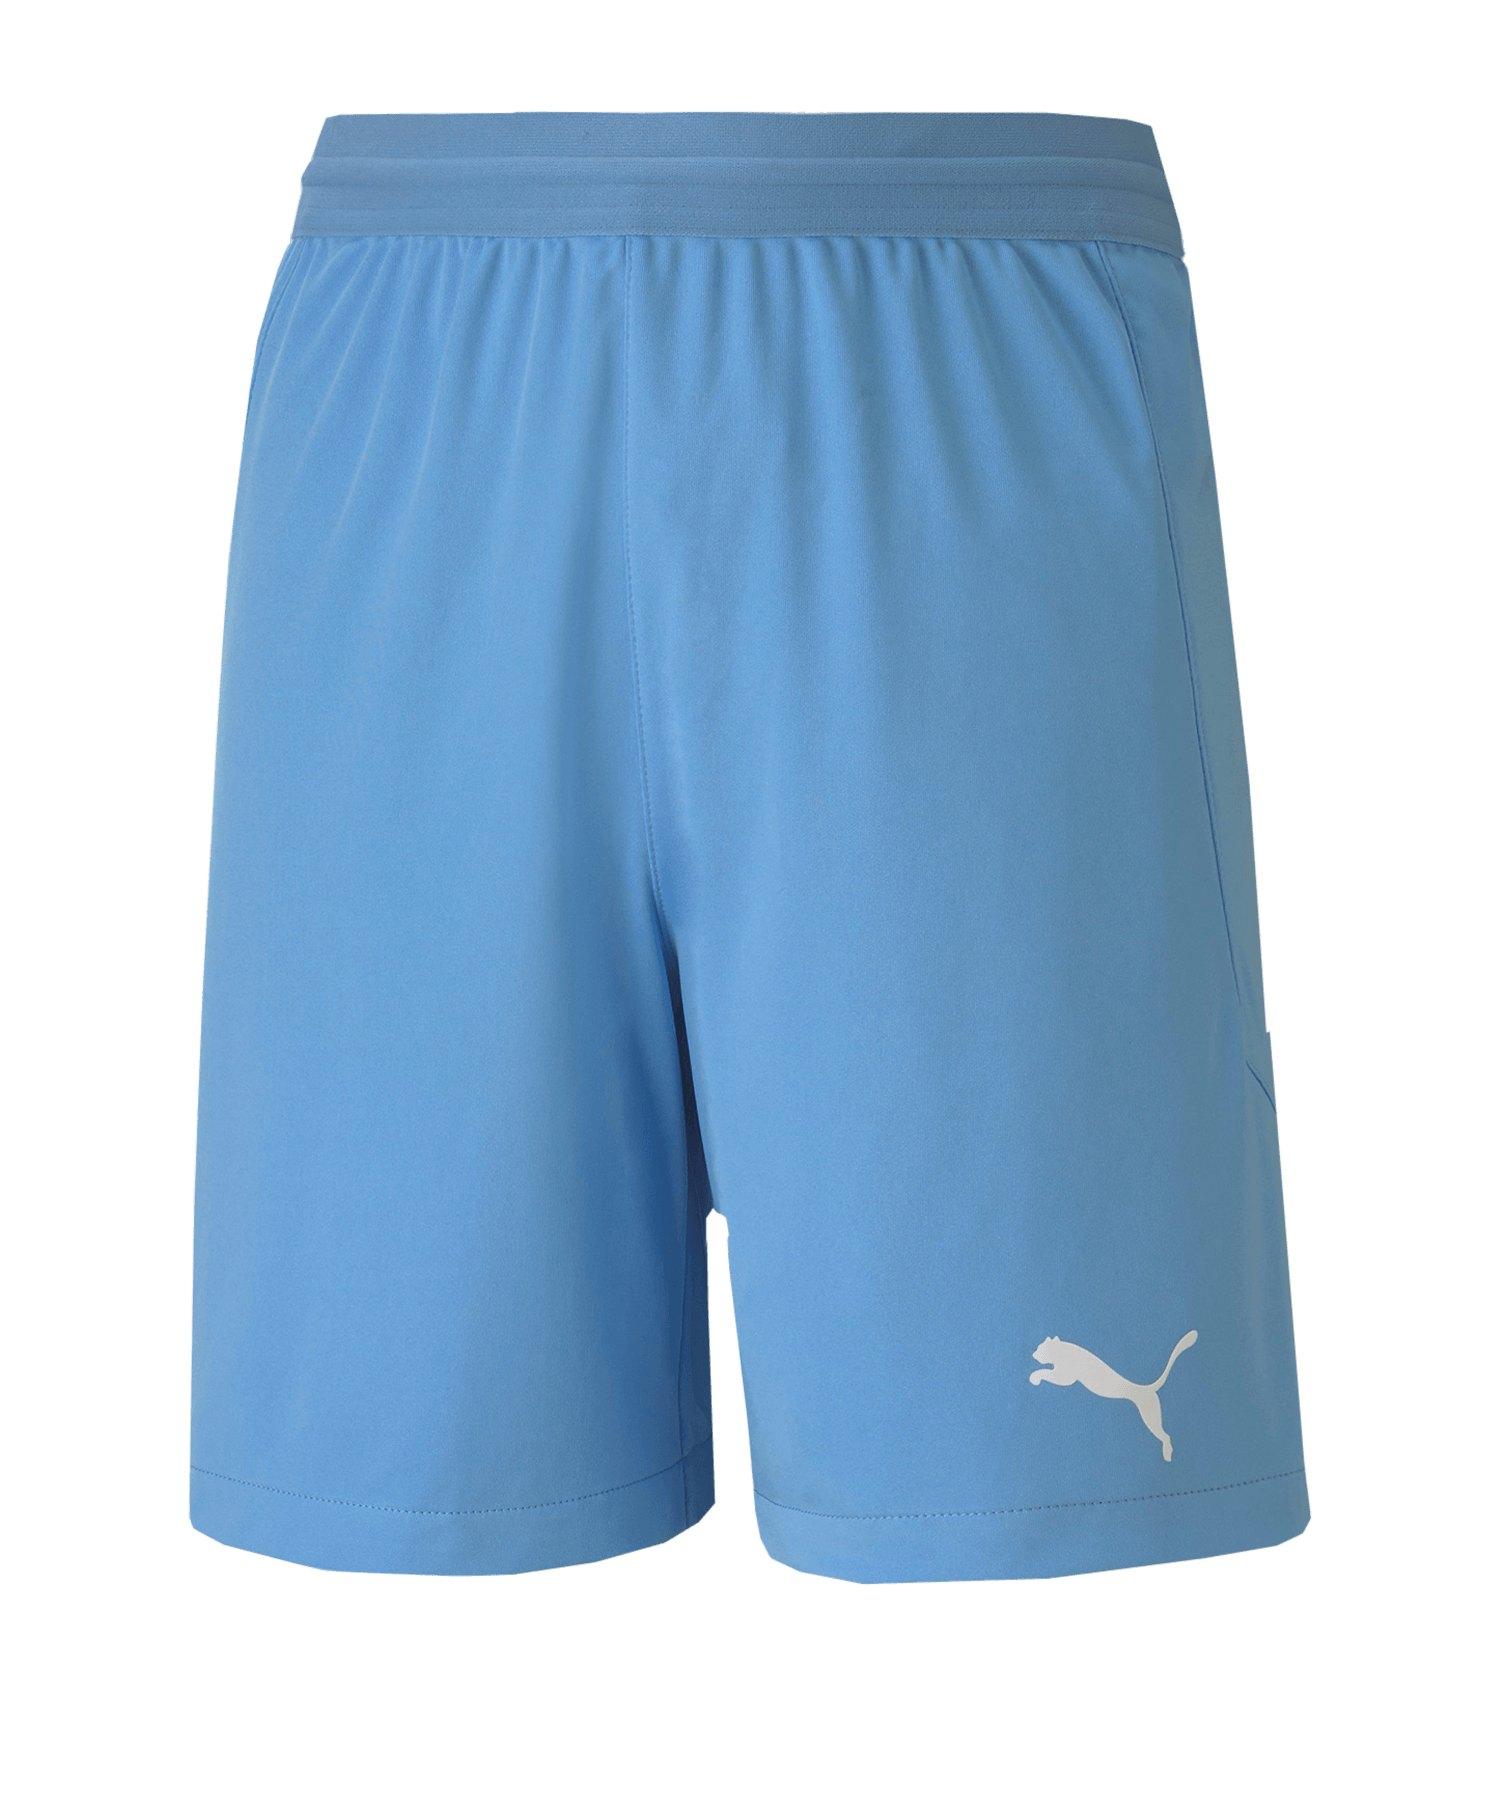 PUMA teamFINAL 21 Knit Short Kids Blau F18 - blau